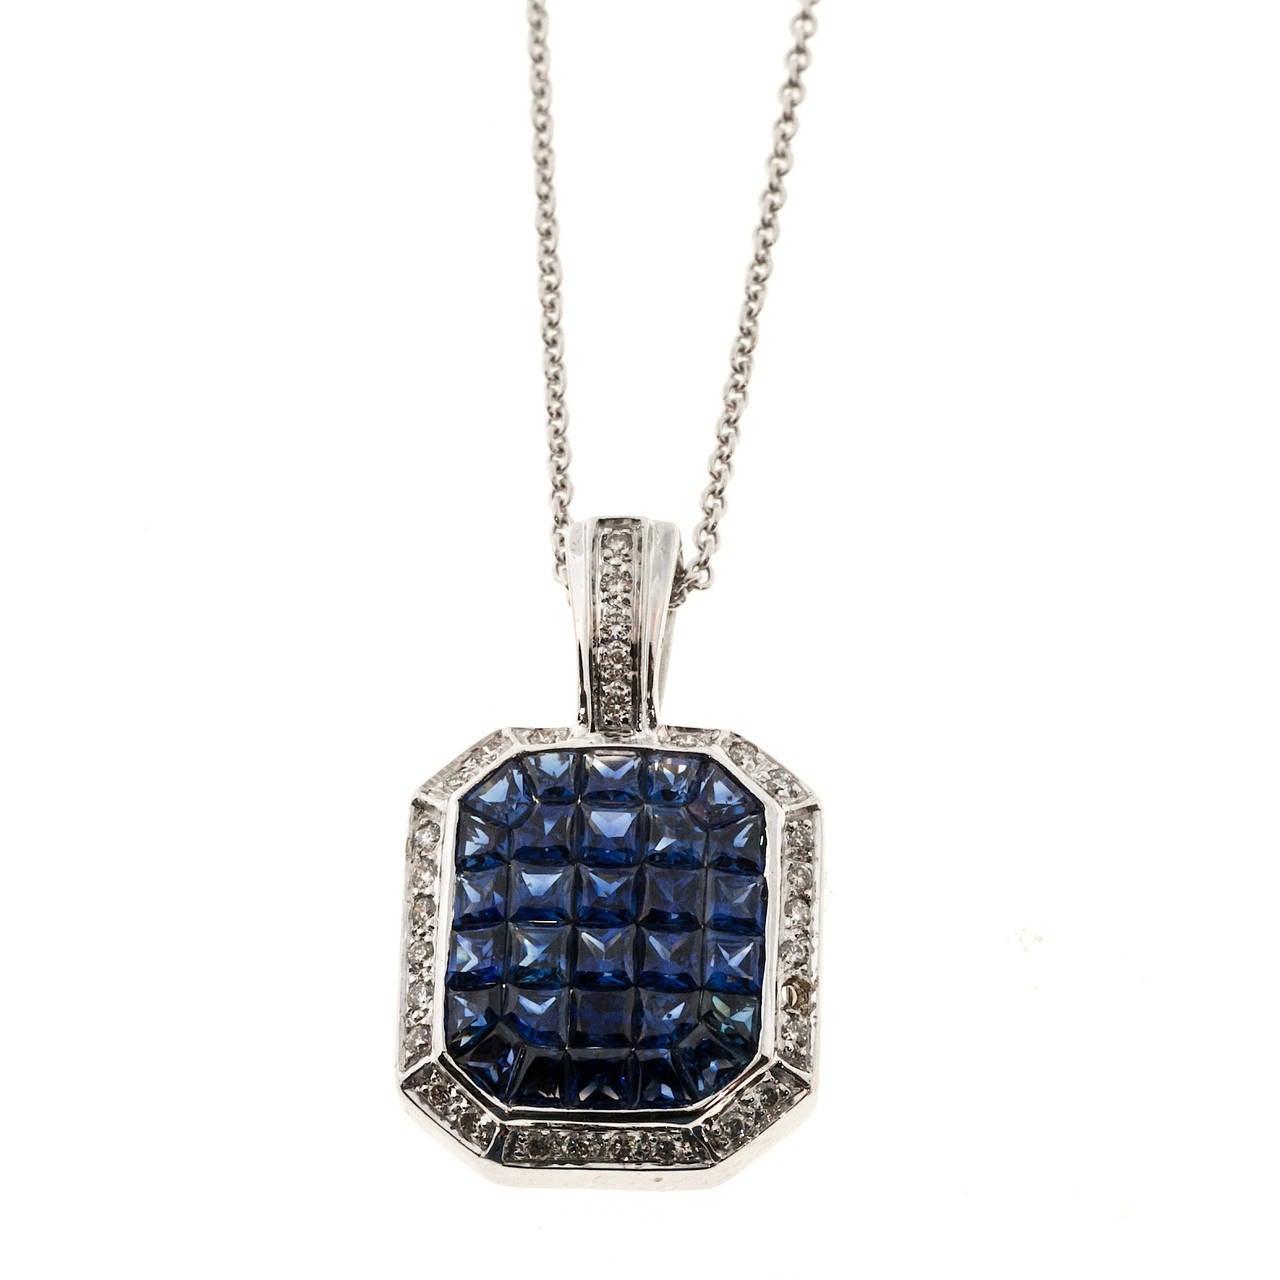 Invisible Set Sapphire Diamond Gold Pendant  Necklace